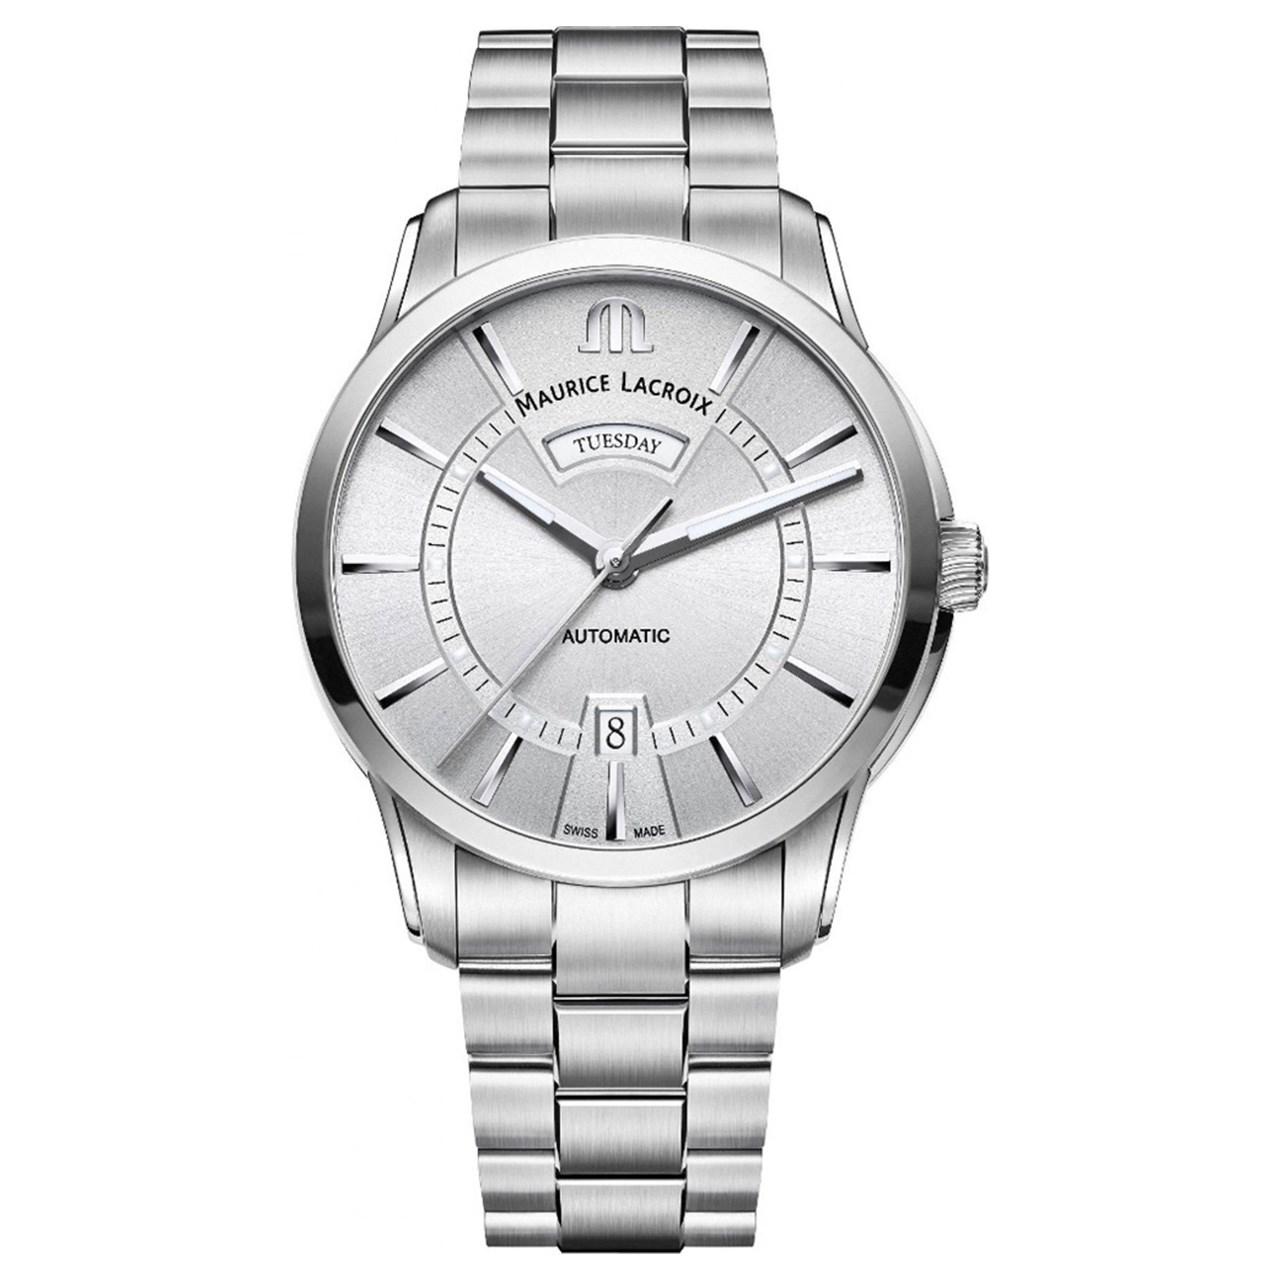 ساعت مچی عقربه ای مردانه موریس لاکروا مدل PT6358-SS002-130-1